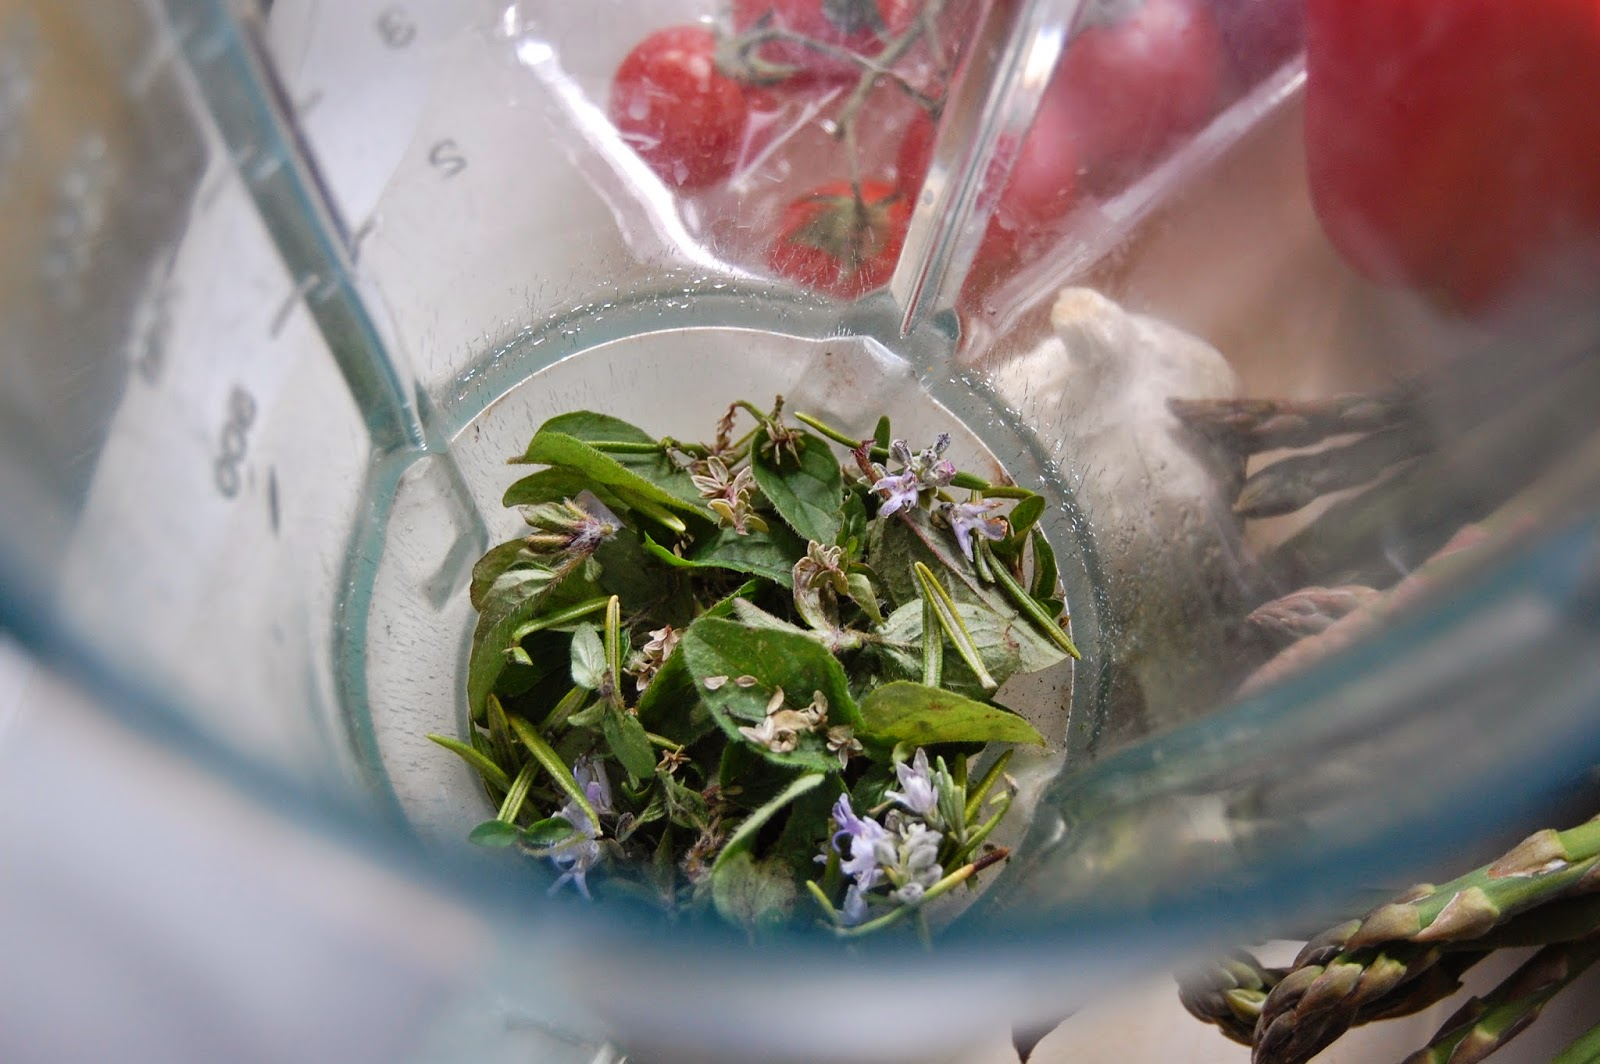 Put herbs in blender